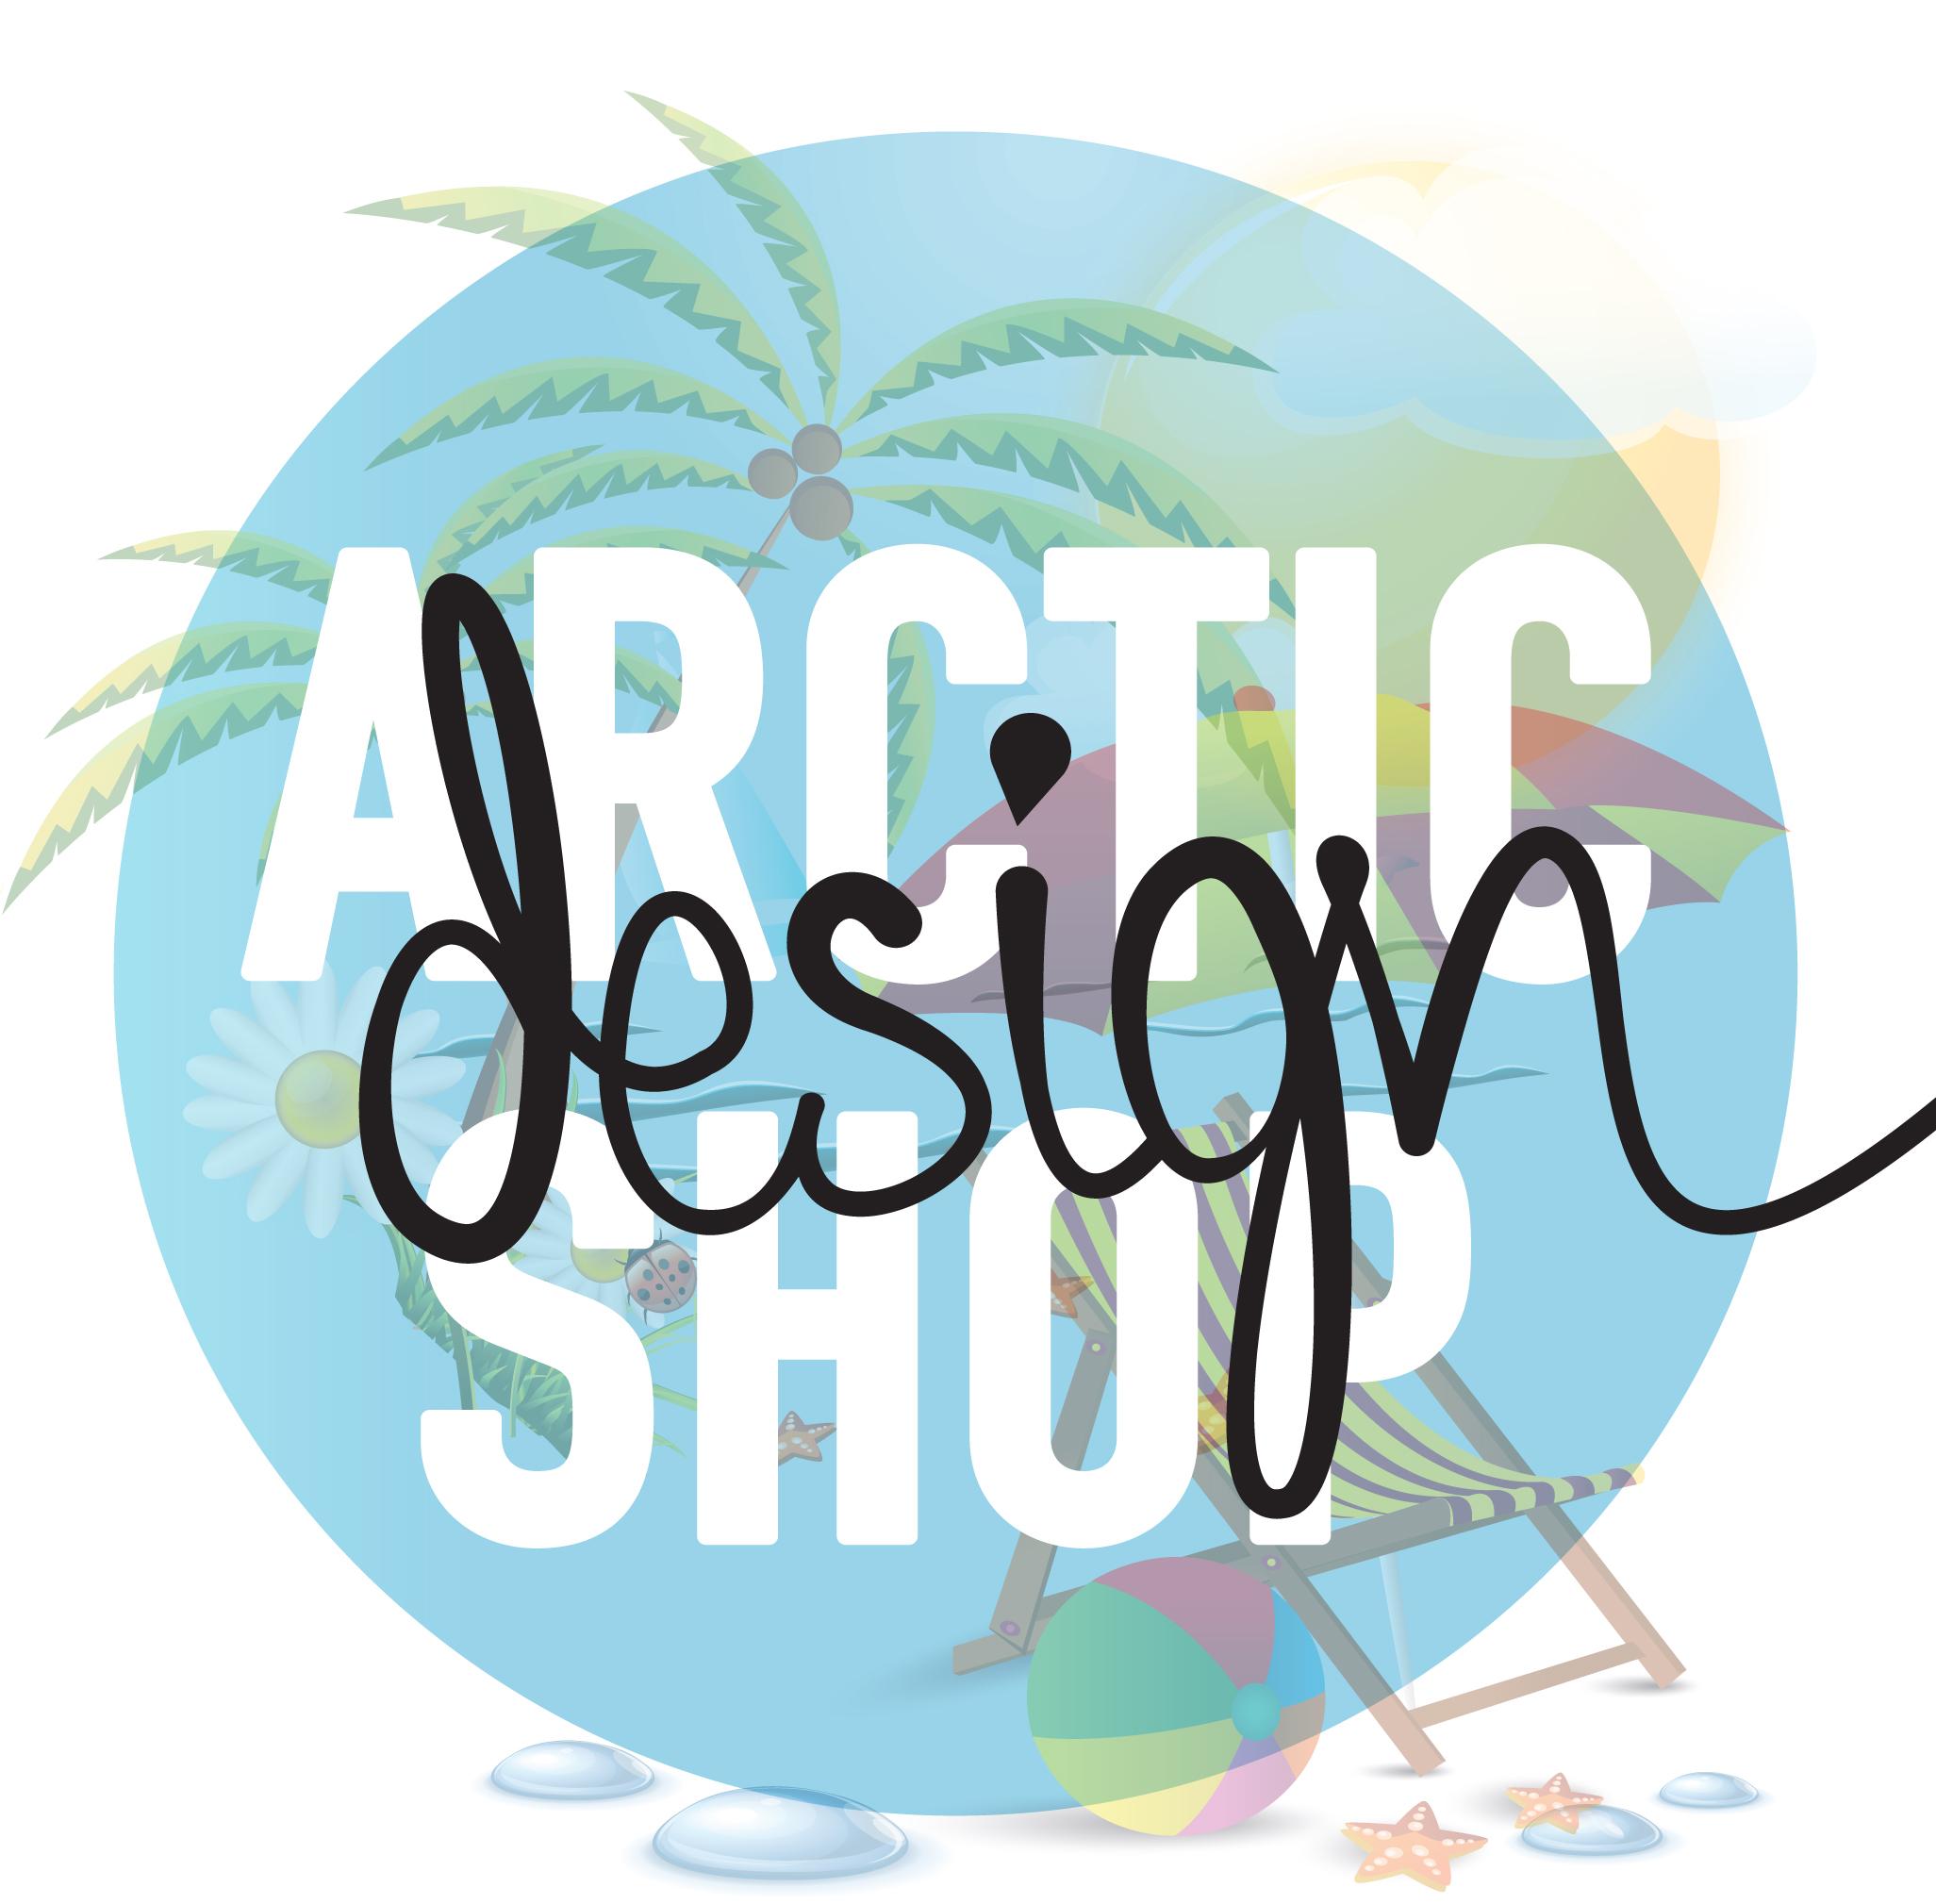 arctic design shop.jpg